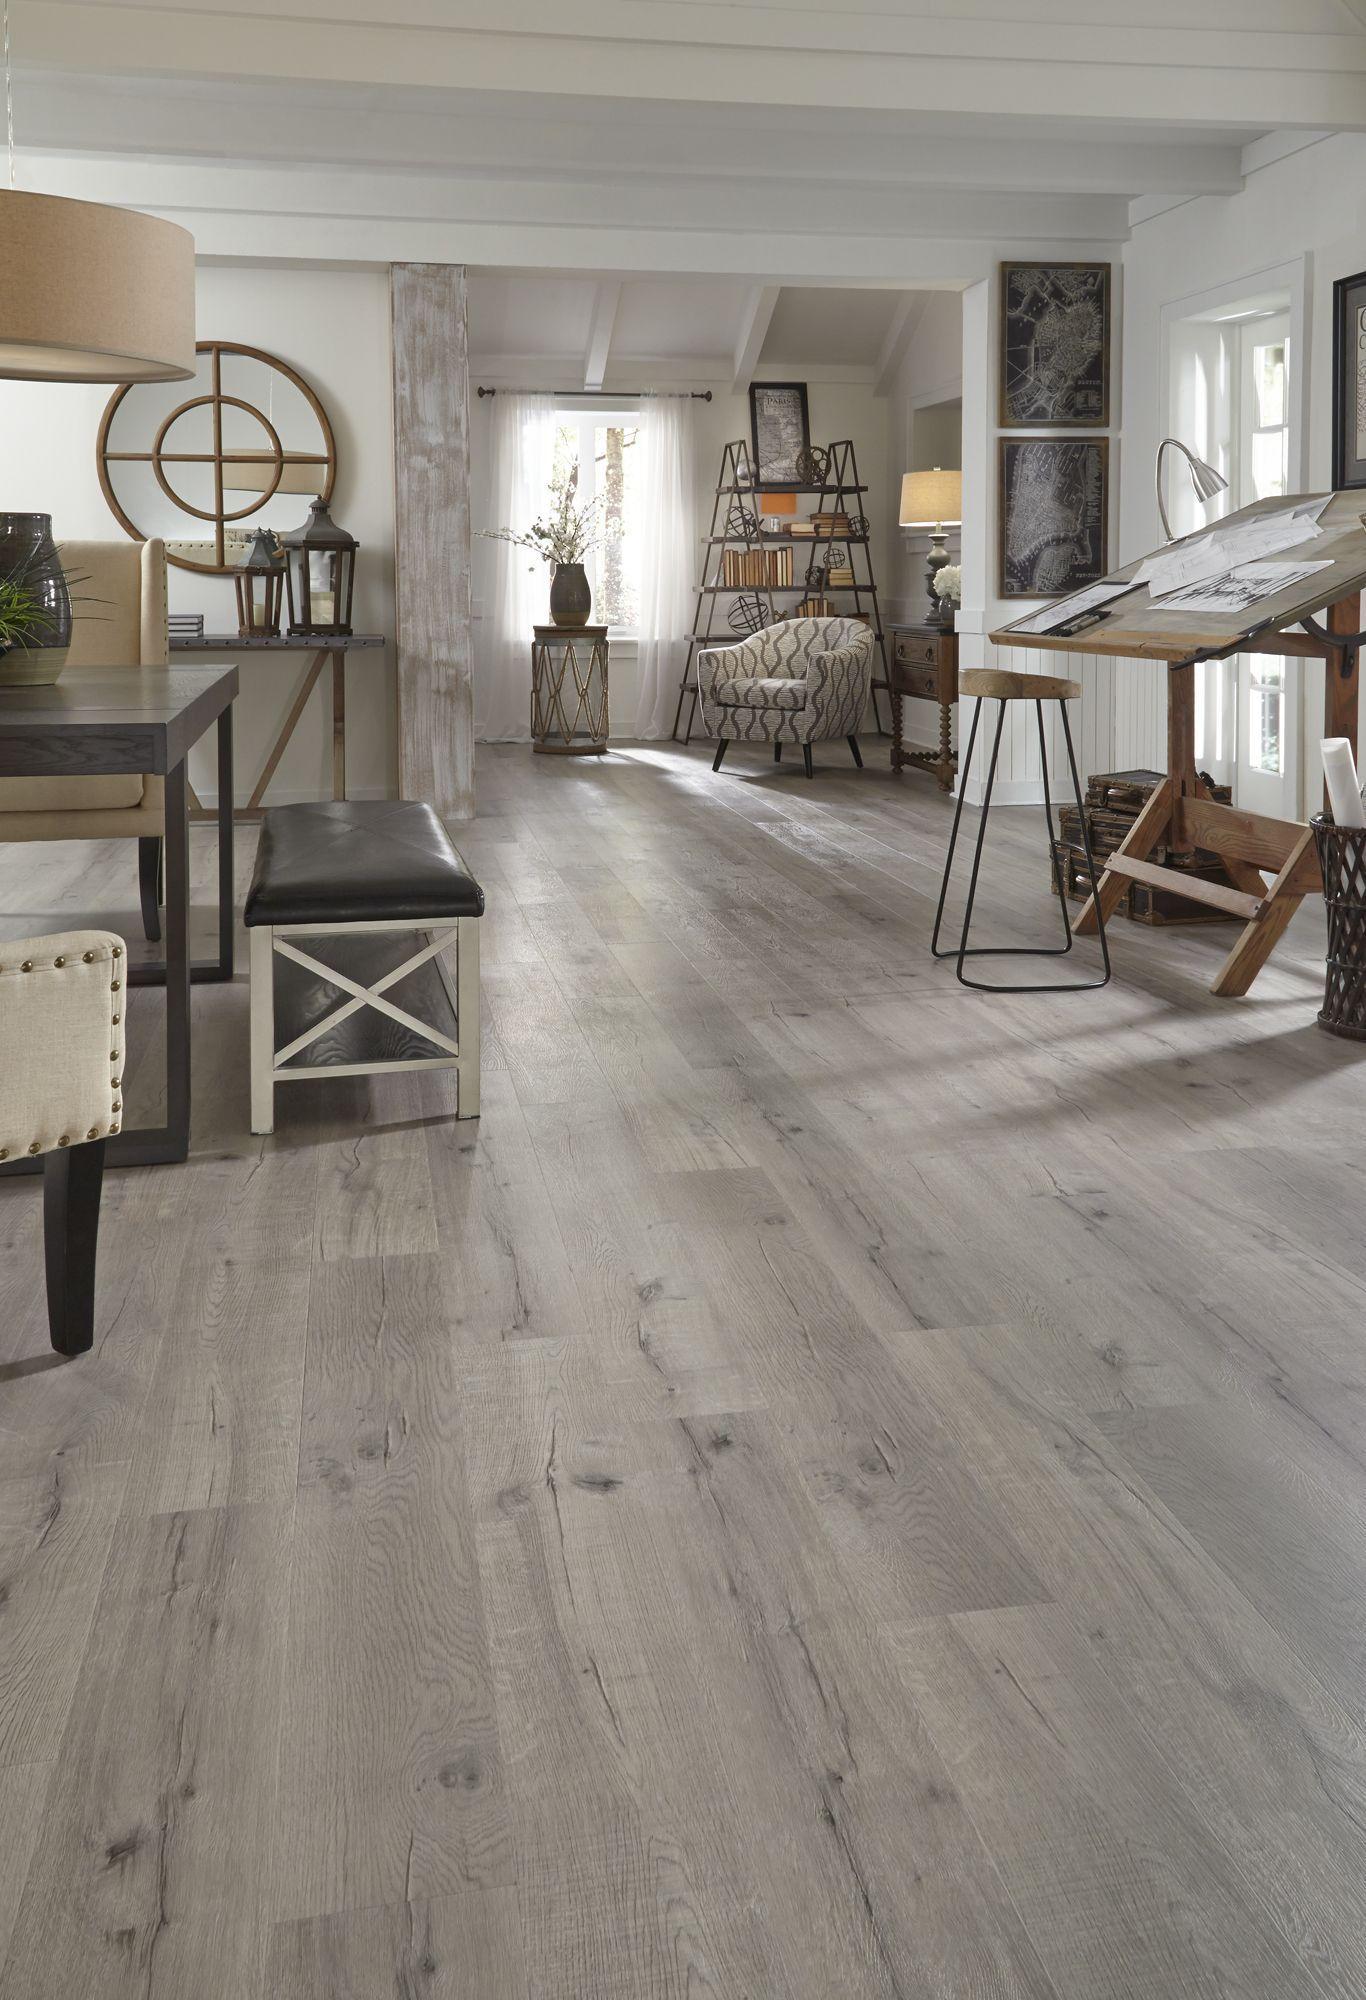 How To Do Vinyl Plank Flooring Transition To Carpet En 2020